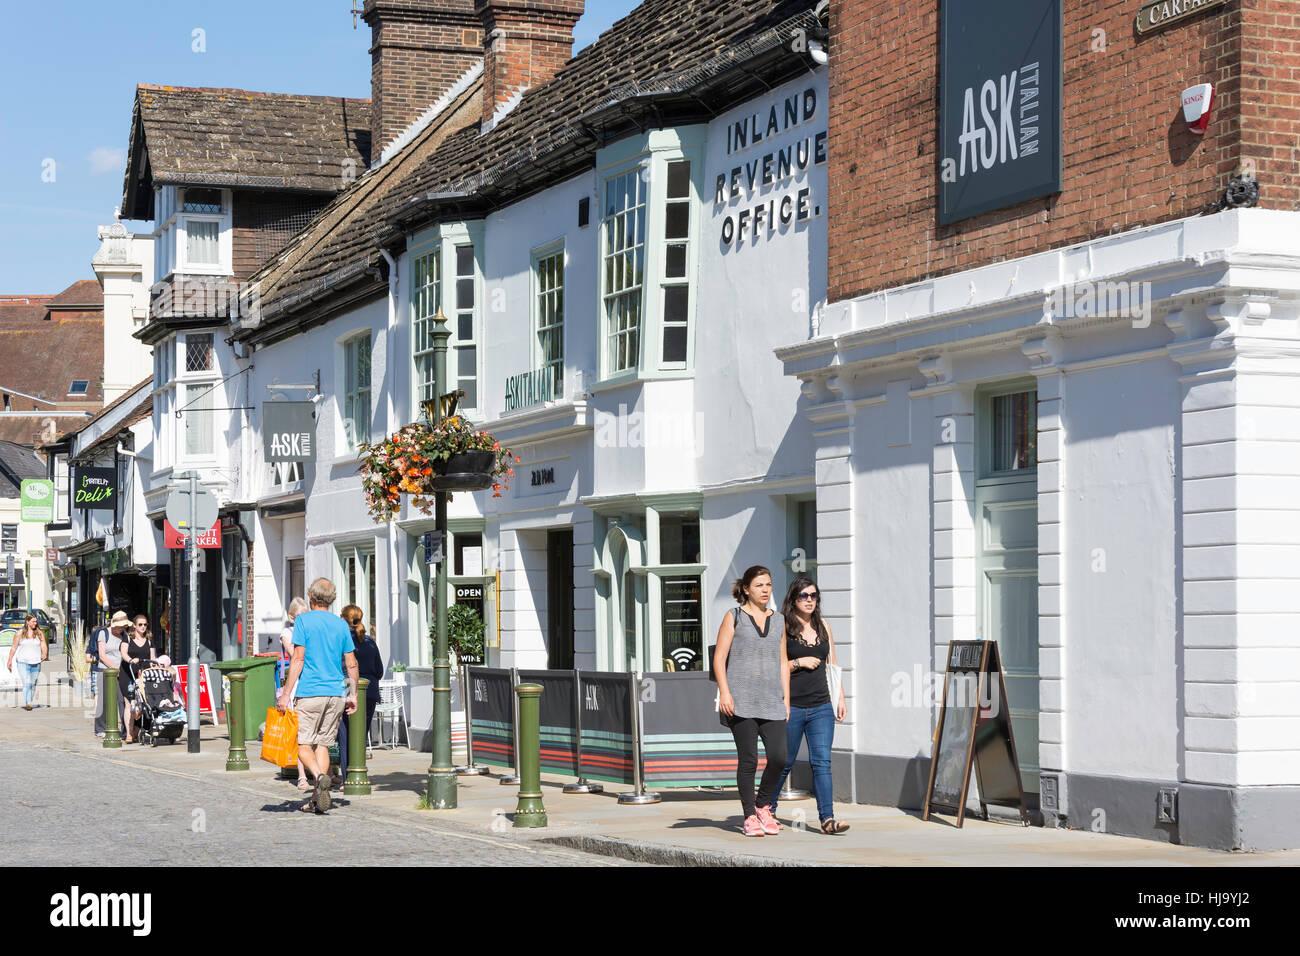 Pregunte en la antigua del siglo xv restaurante Olde Kings Head Hotel, Carfax, Horsham, West Sussex, Inglaterra, Foto de stock